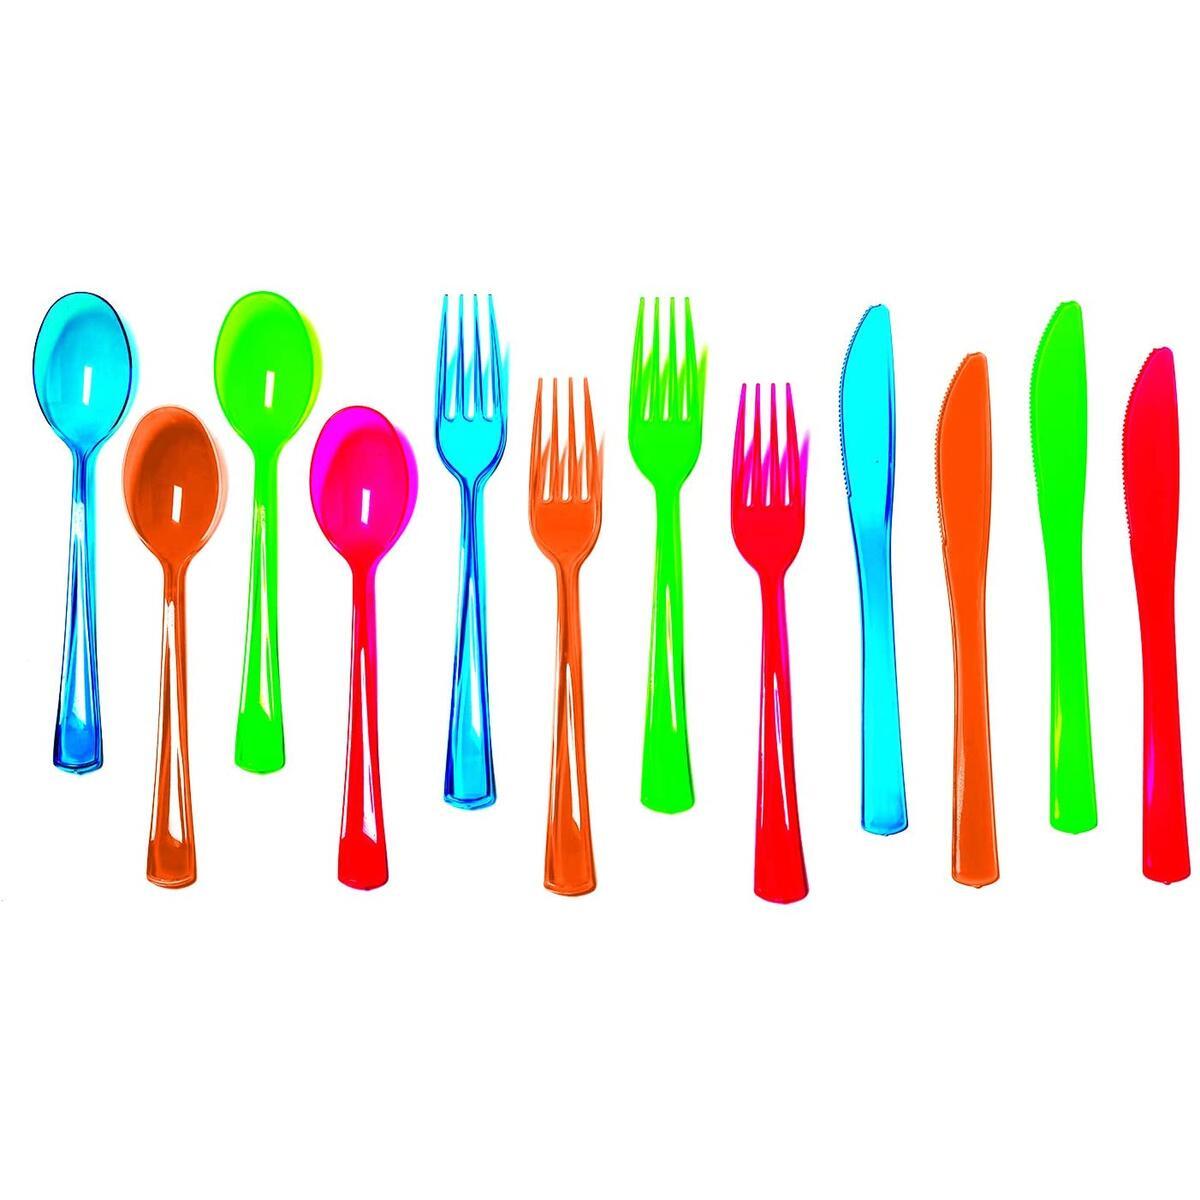 Grow in Dark Neon Heavy-Duty Hard Plastic Cutlery Combo Pack, 80 Place Settings